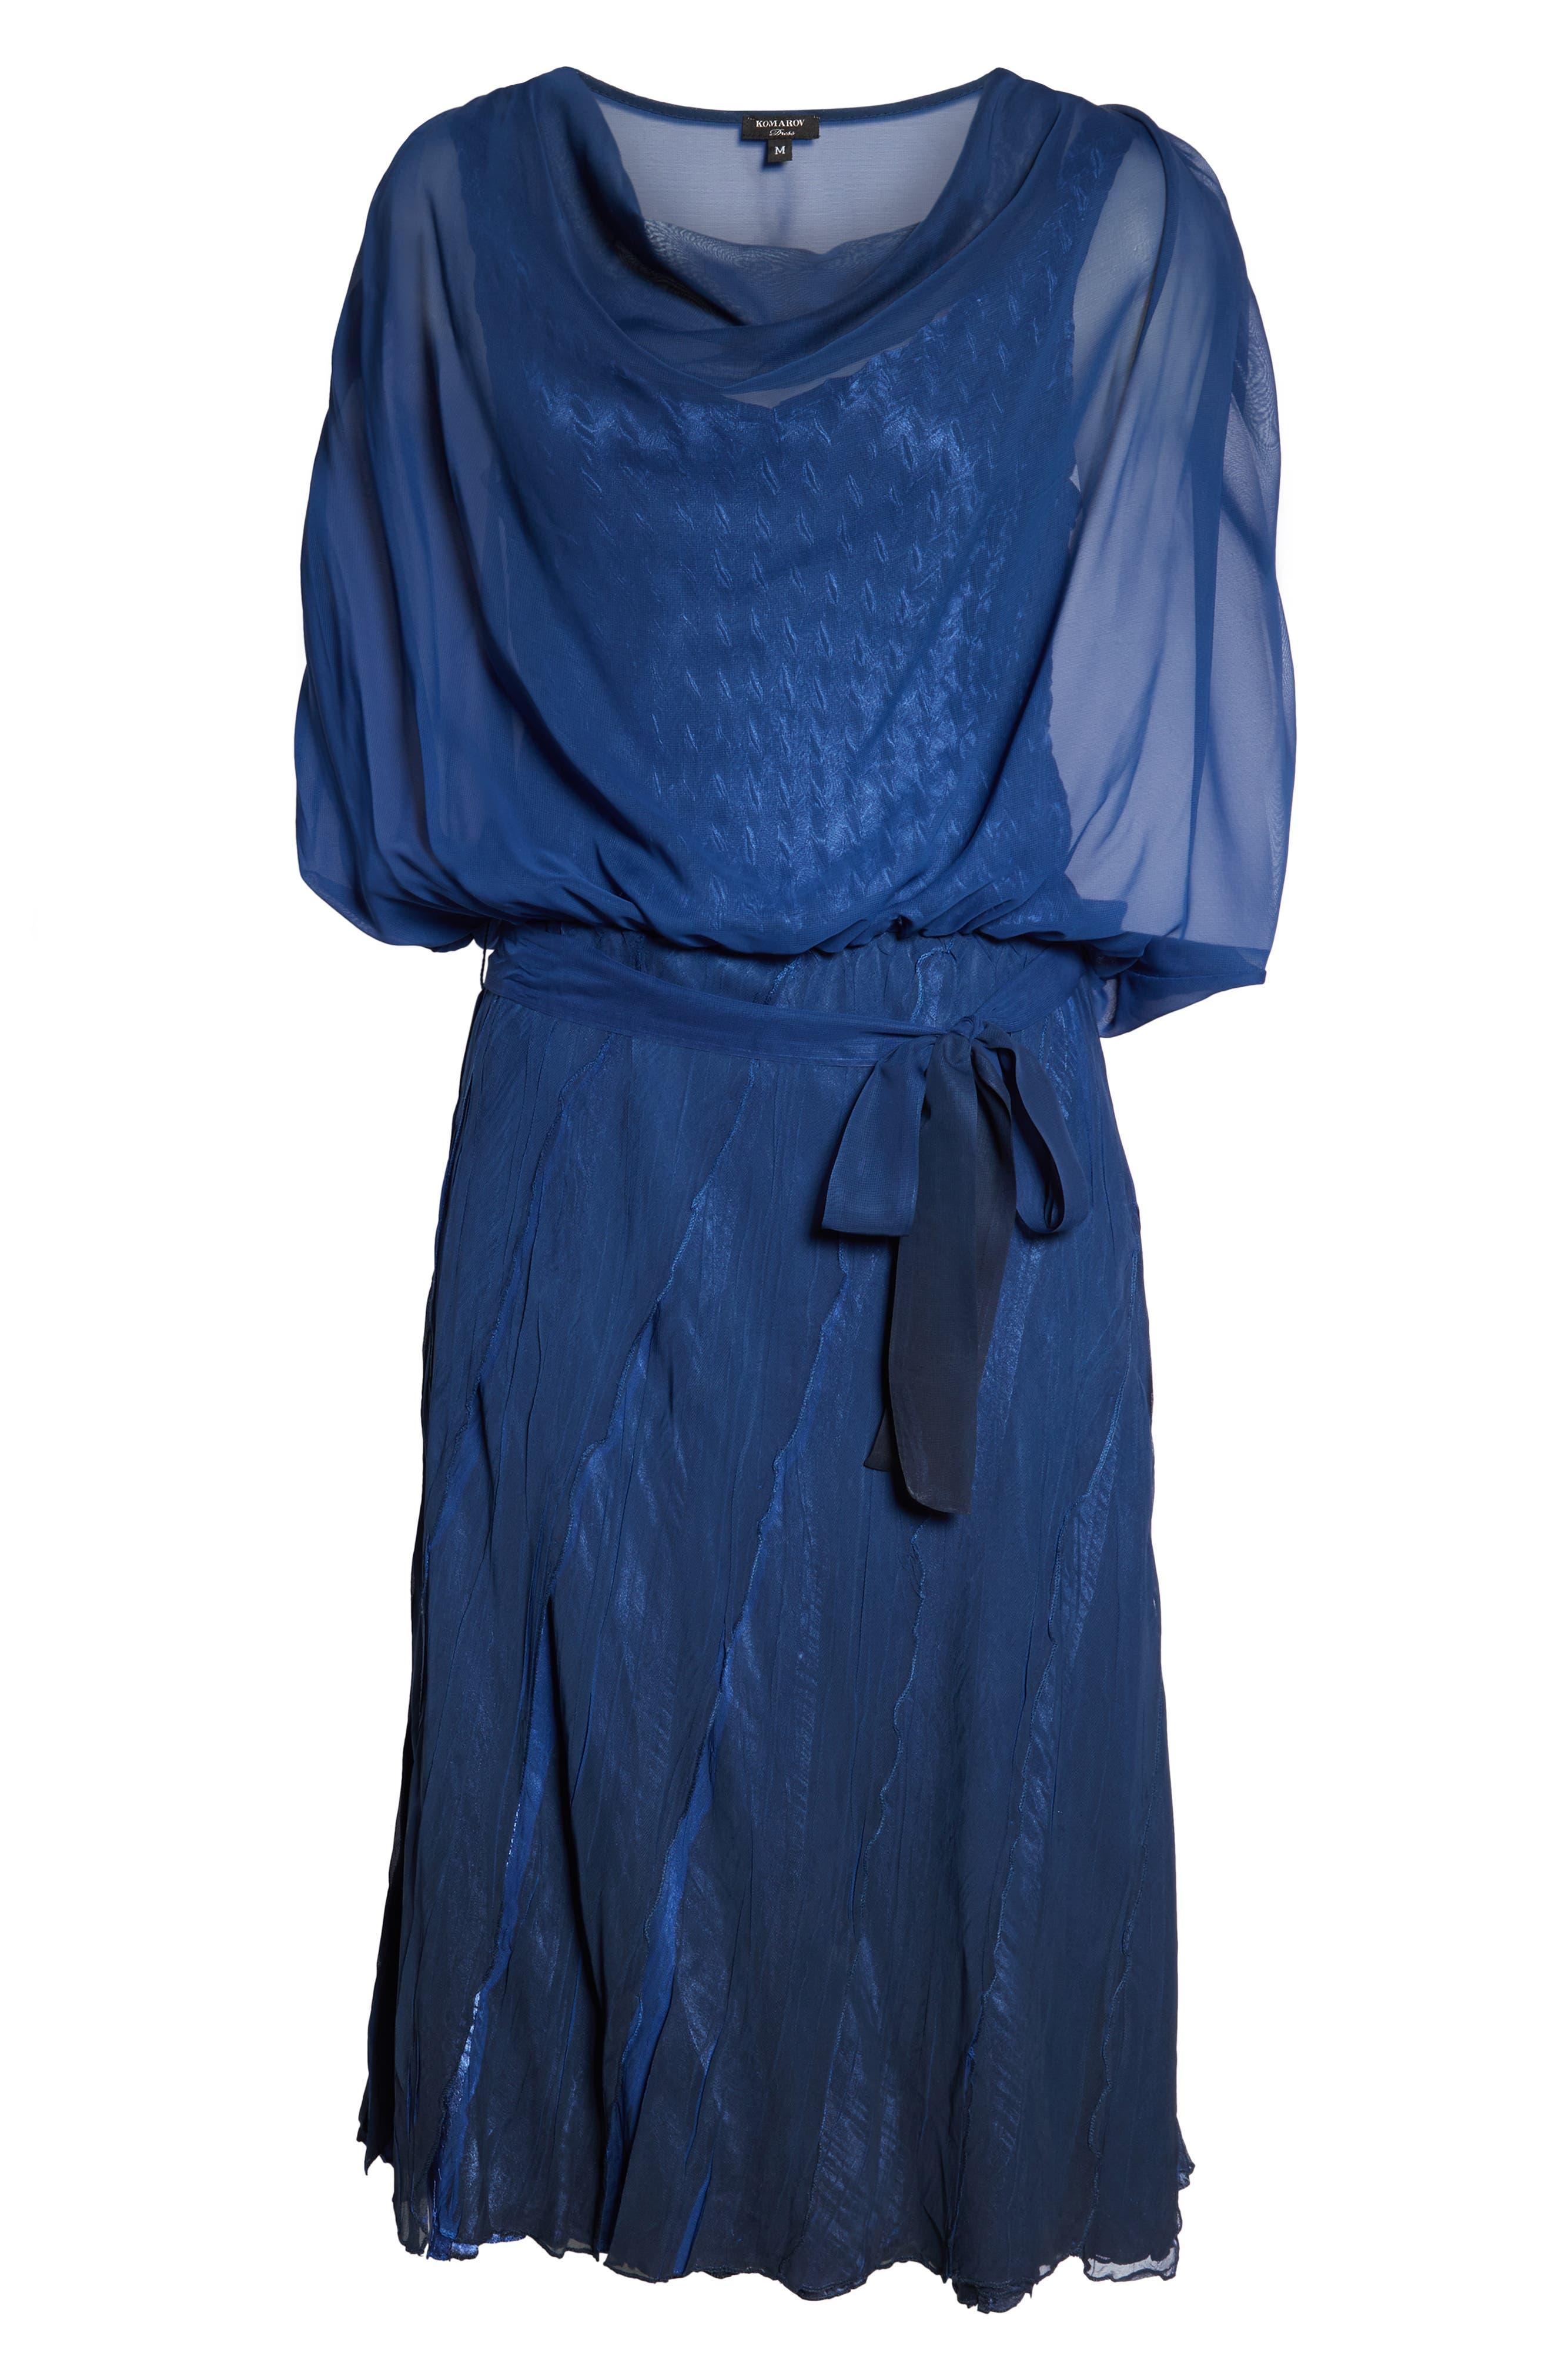 Blouson Tiered Dress,                             Alternate thumbnail 4, color,                             NAVY BLACK OMBRE